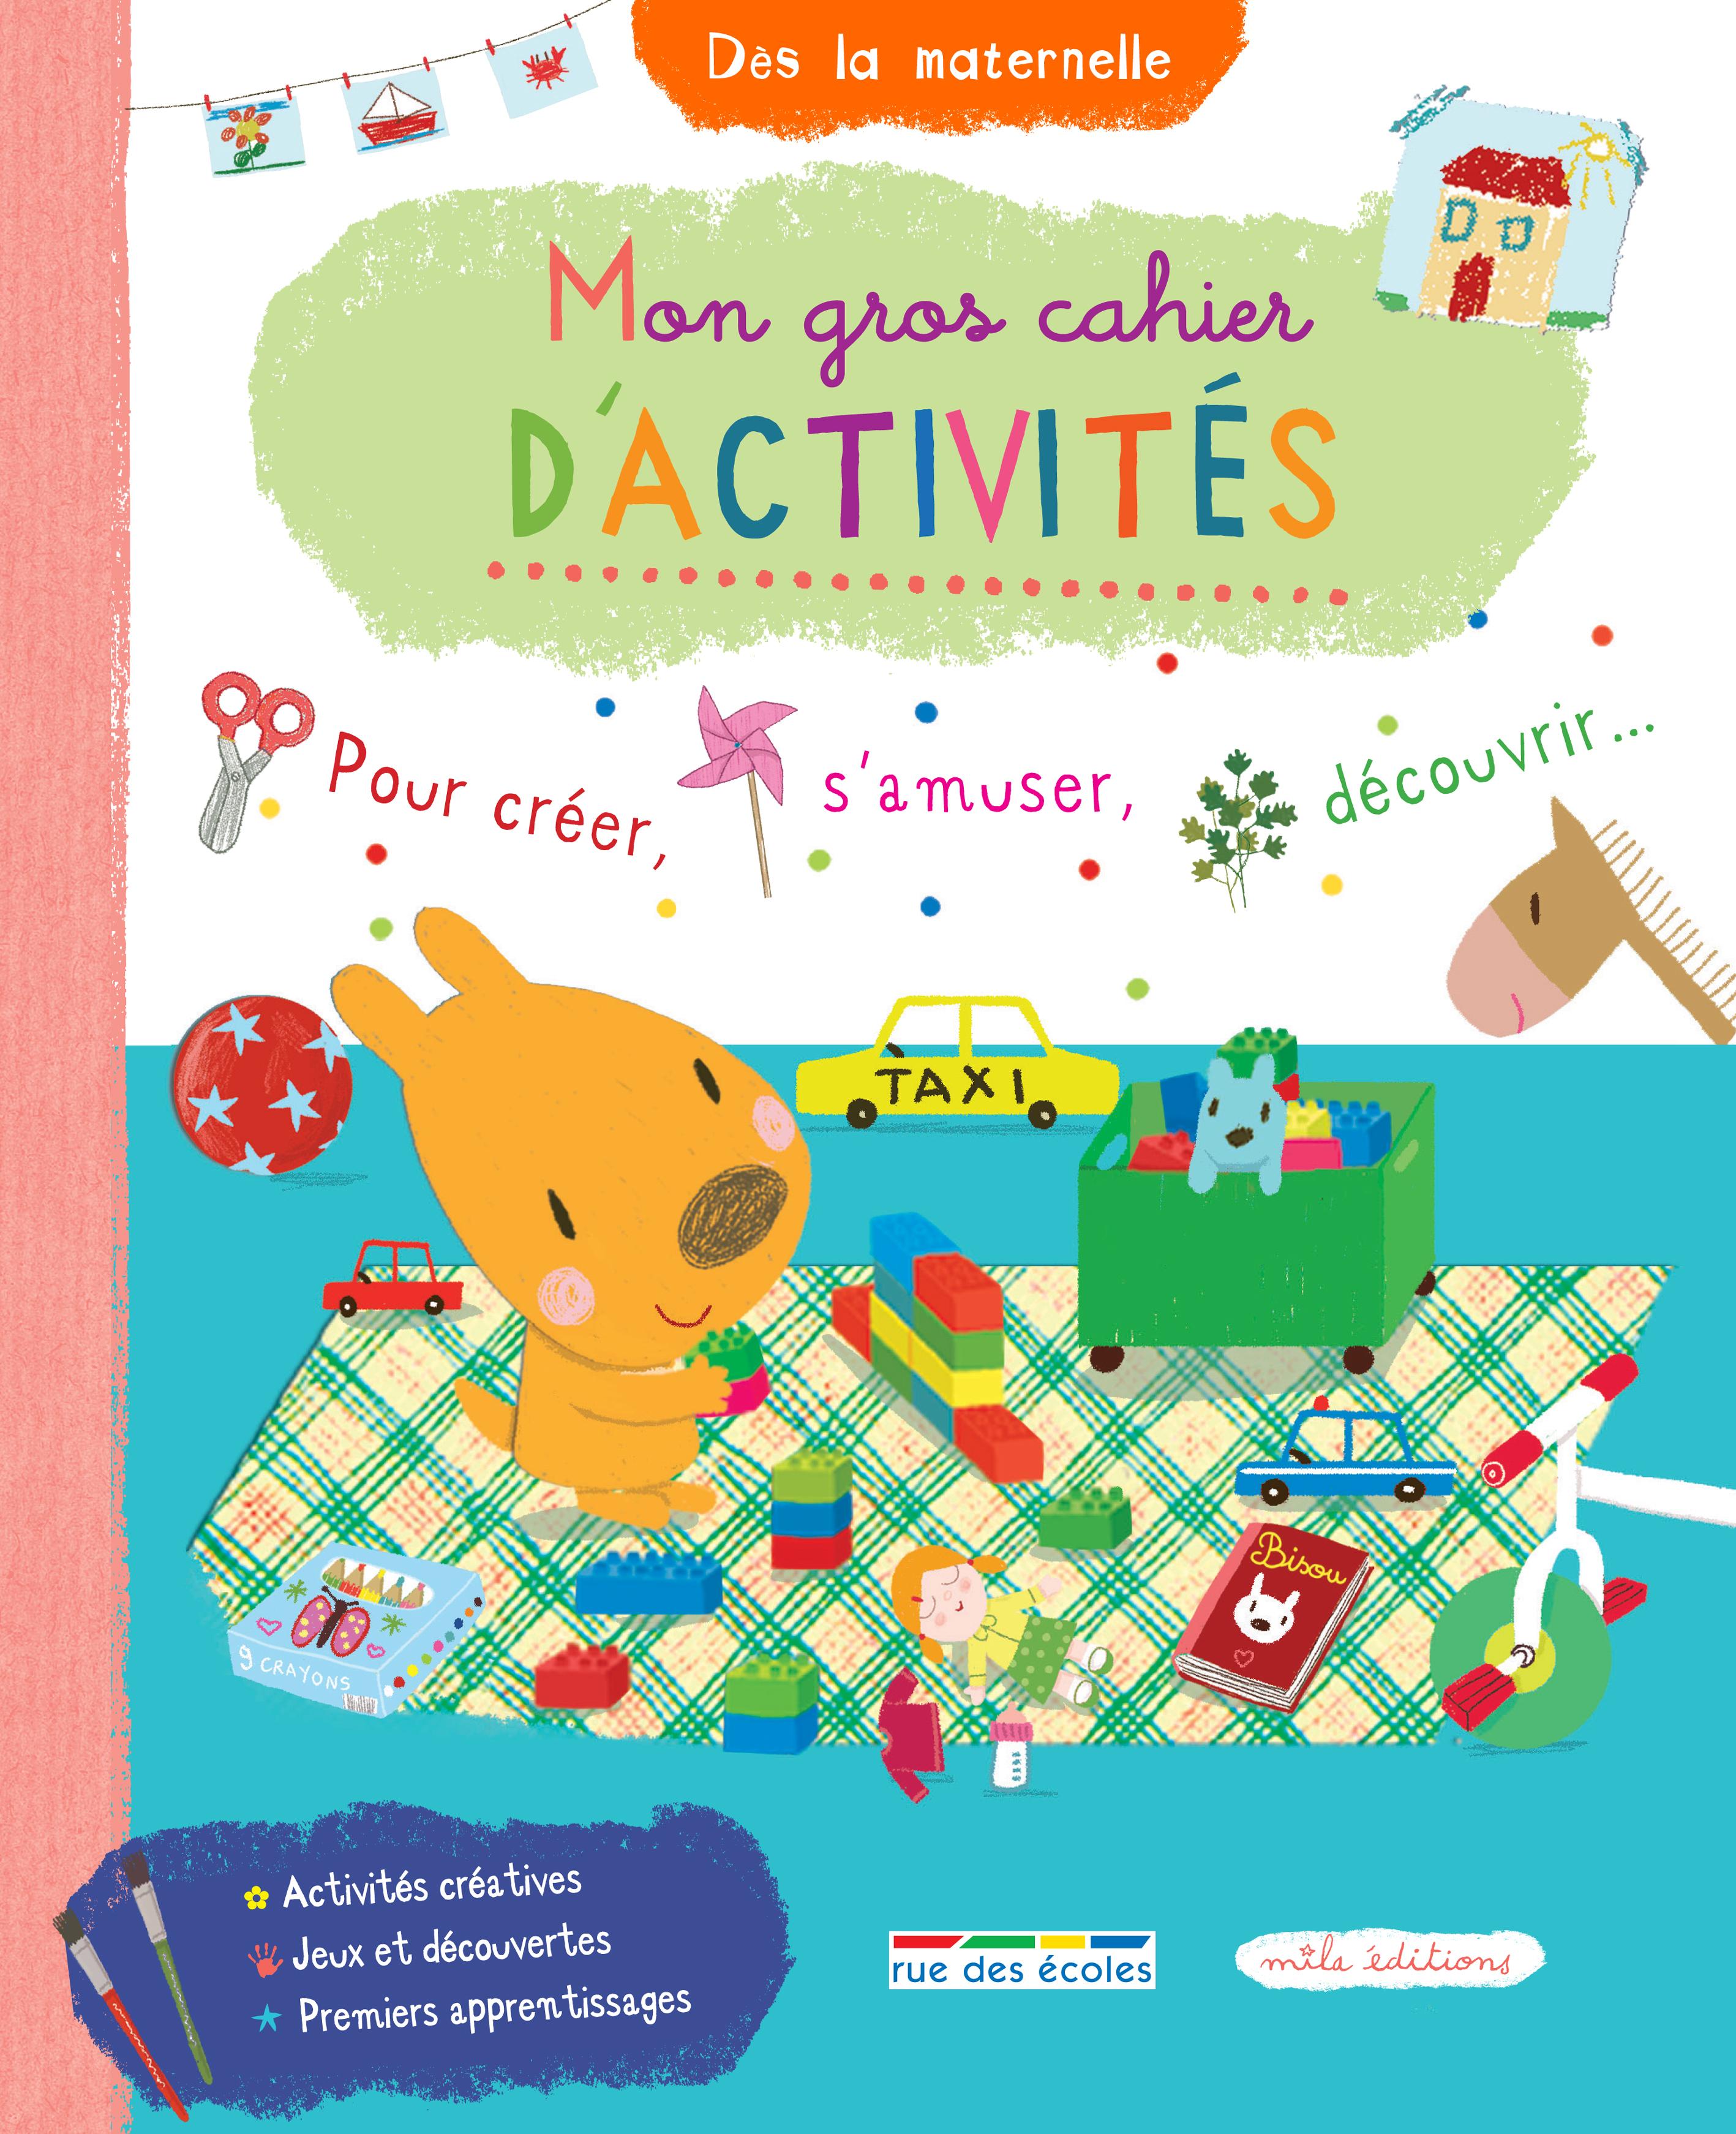 GROS CAHIER D'ACTIVITES (MON)